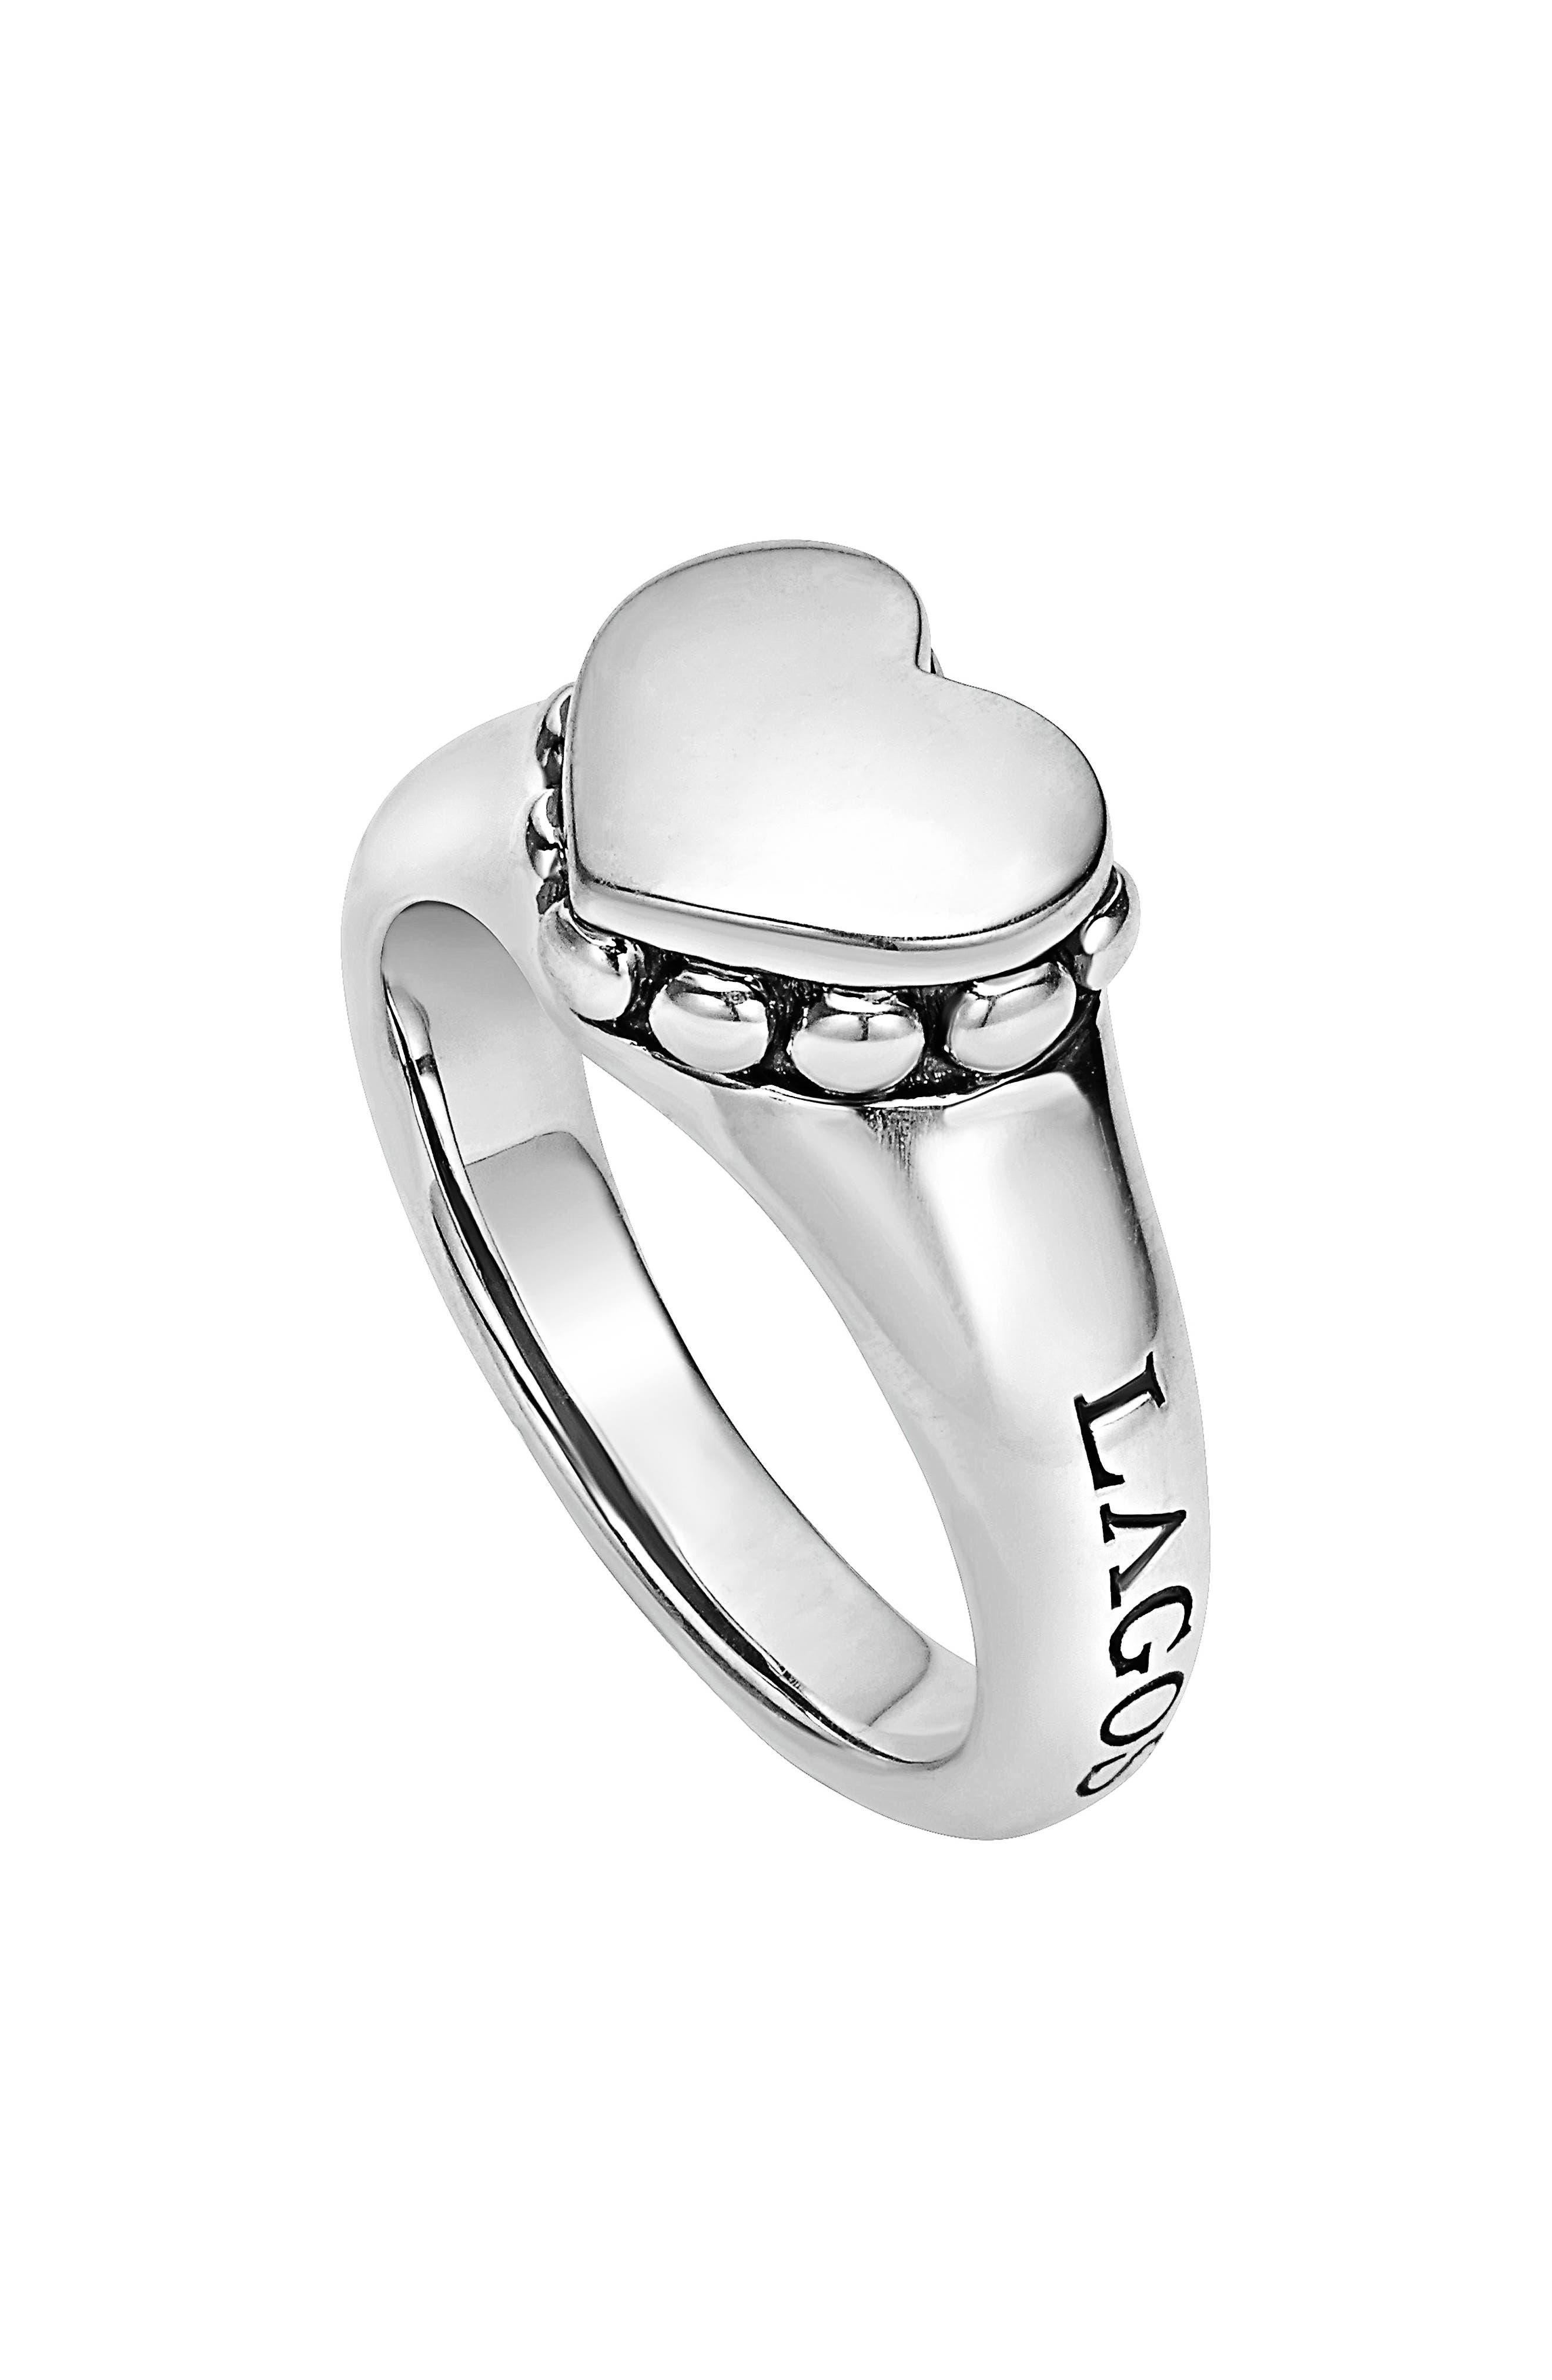 Main Image - LAGOS 'Beloved' Small Heart Ring